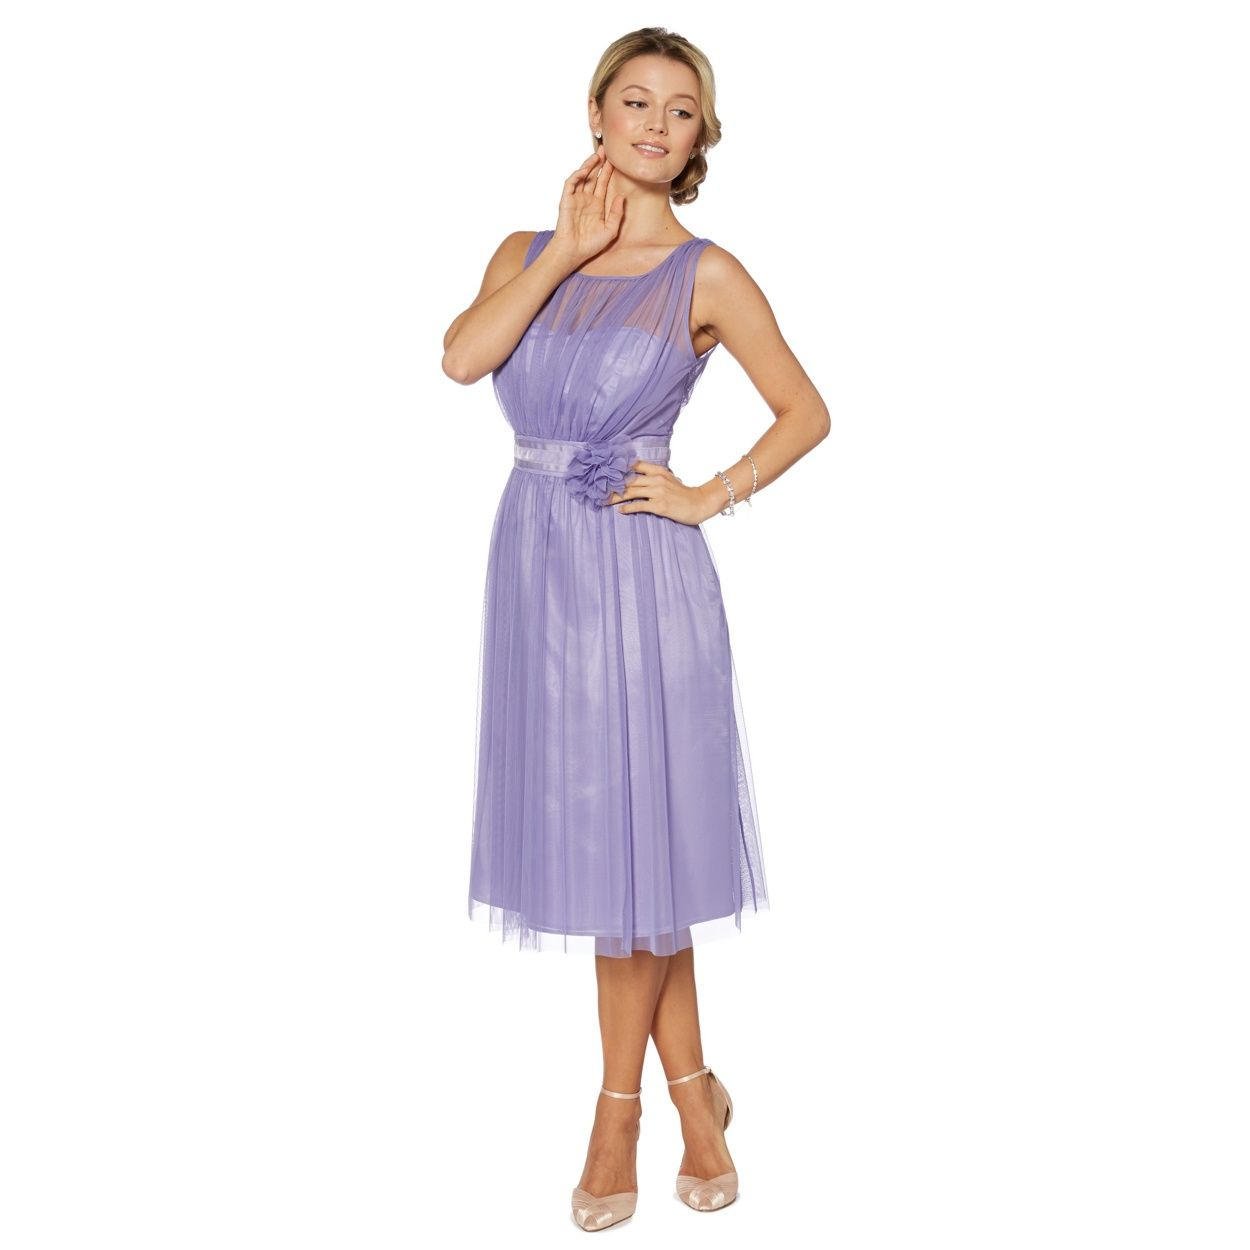 Debut lilac mesh build corsage midi dress at debenhams debut lilac mesh build corsage midi dress at debenhams ombrellifo Images